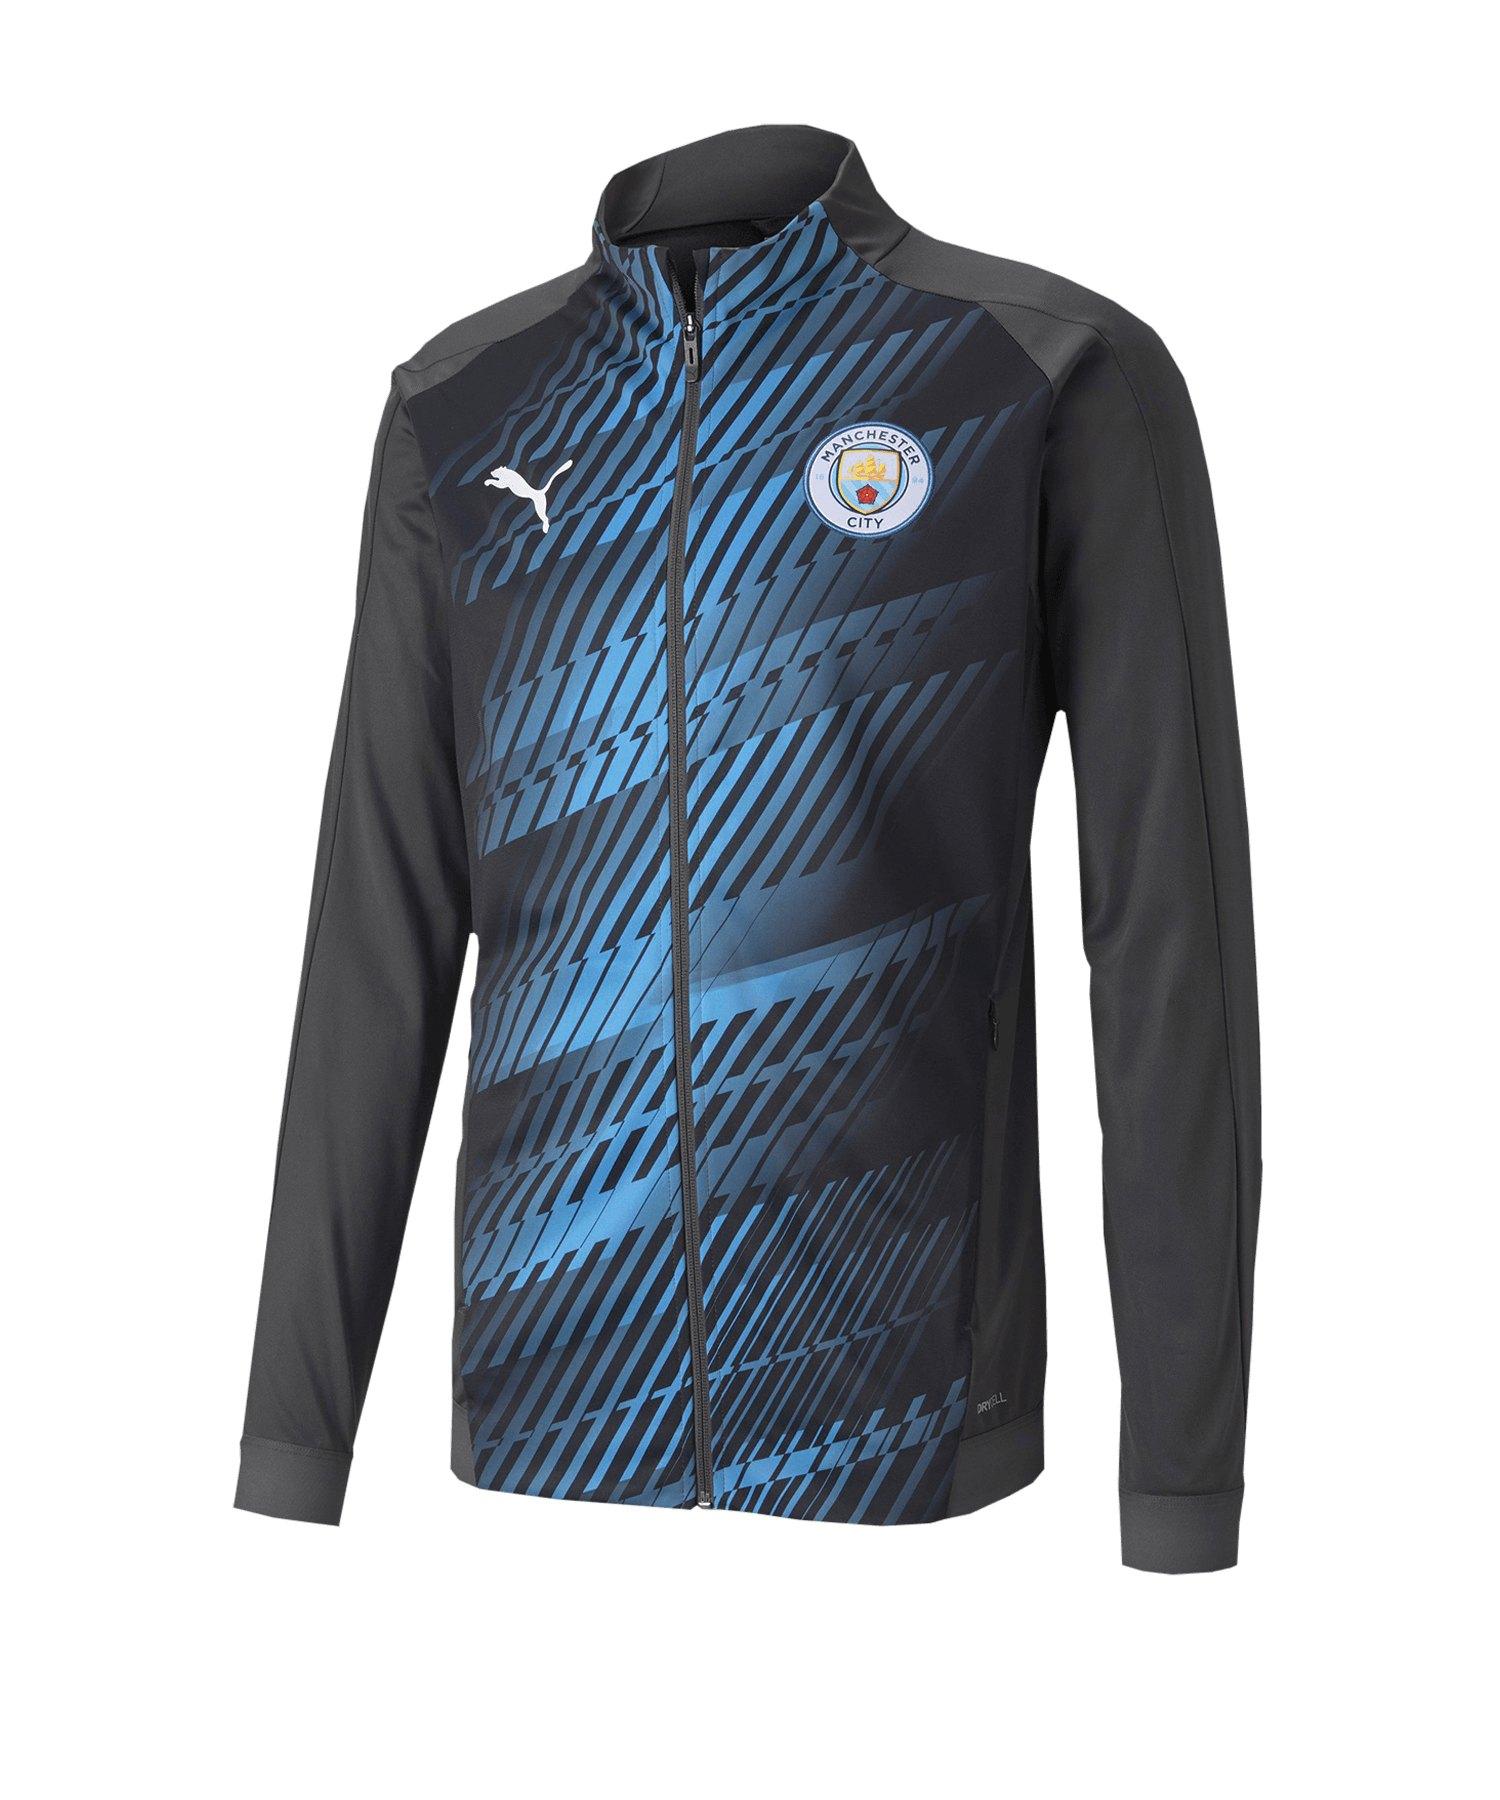 Puma Manchester City Prematch League Jacke F25 - grau